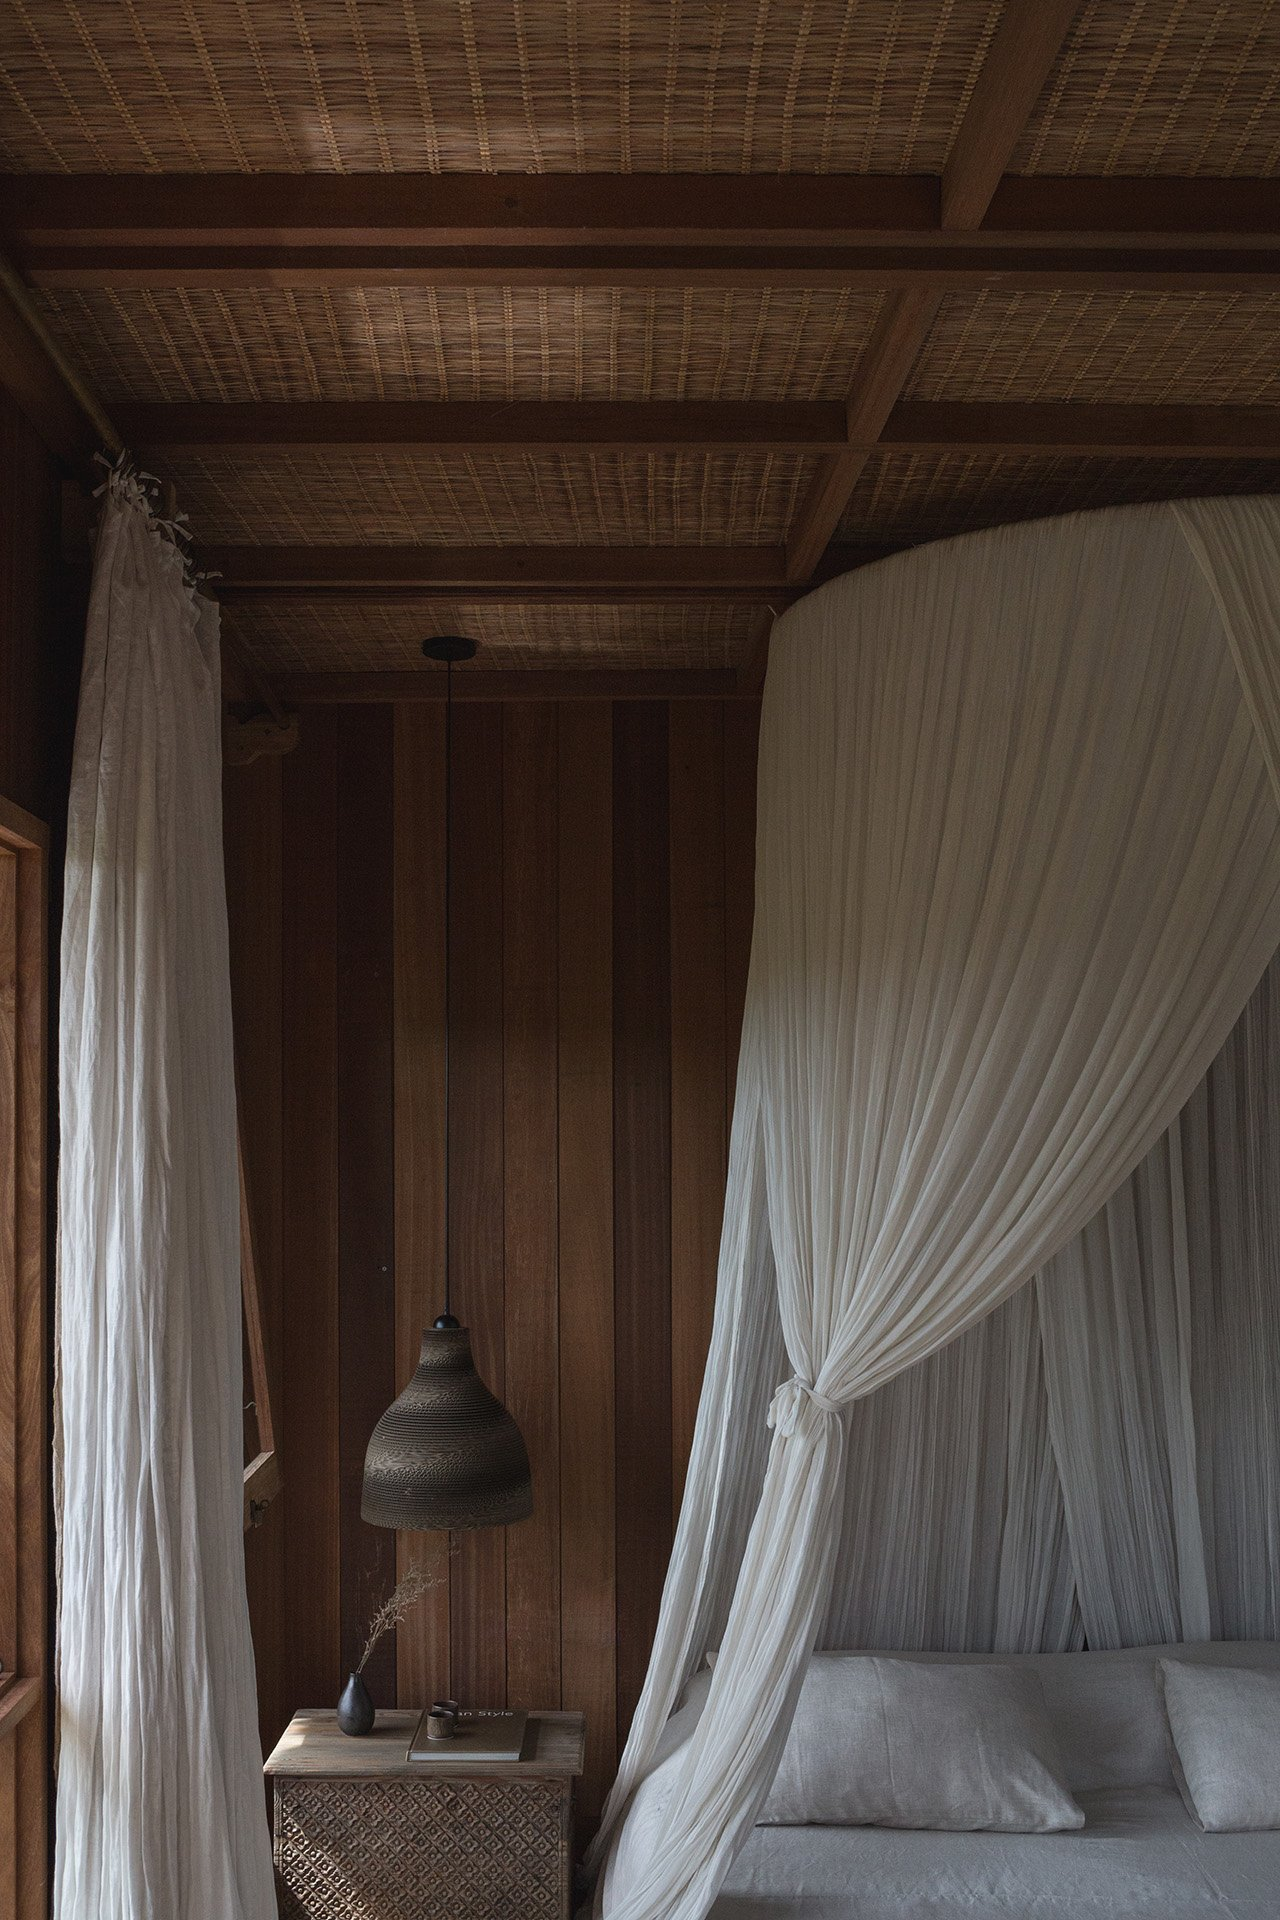 The Chaplin bedroom. Photo by Jencquel Tommaso Riva. Styling byLisa Scapin.